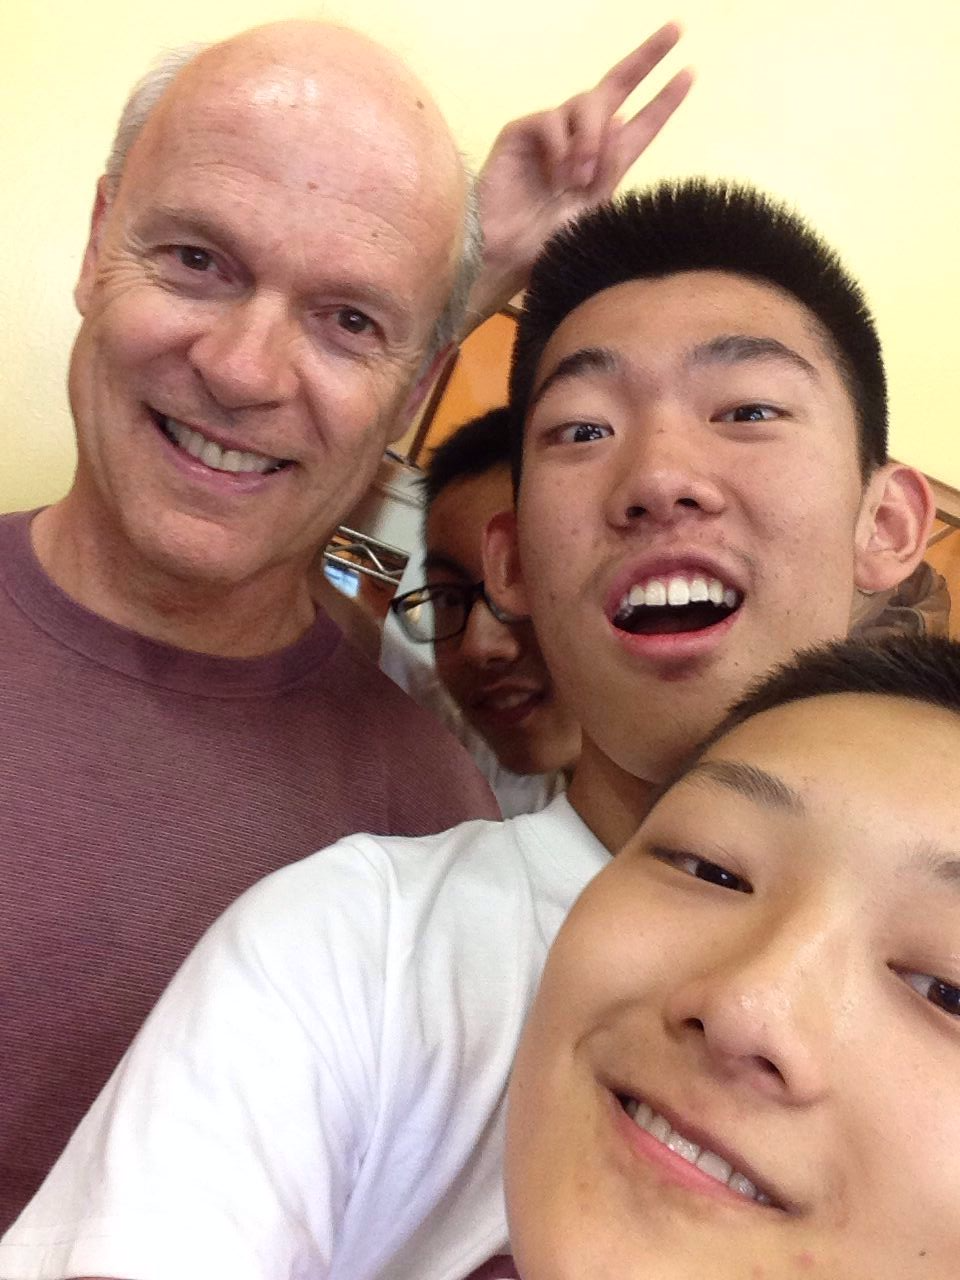 Peter陪志愿者一起Selfie